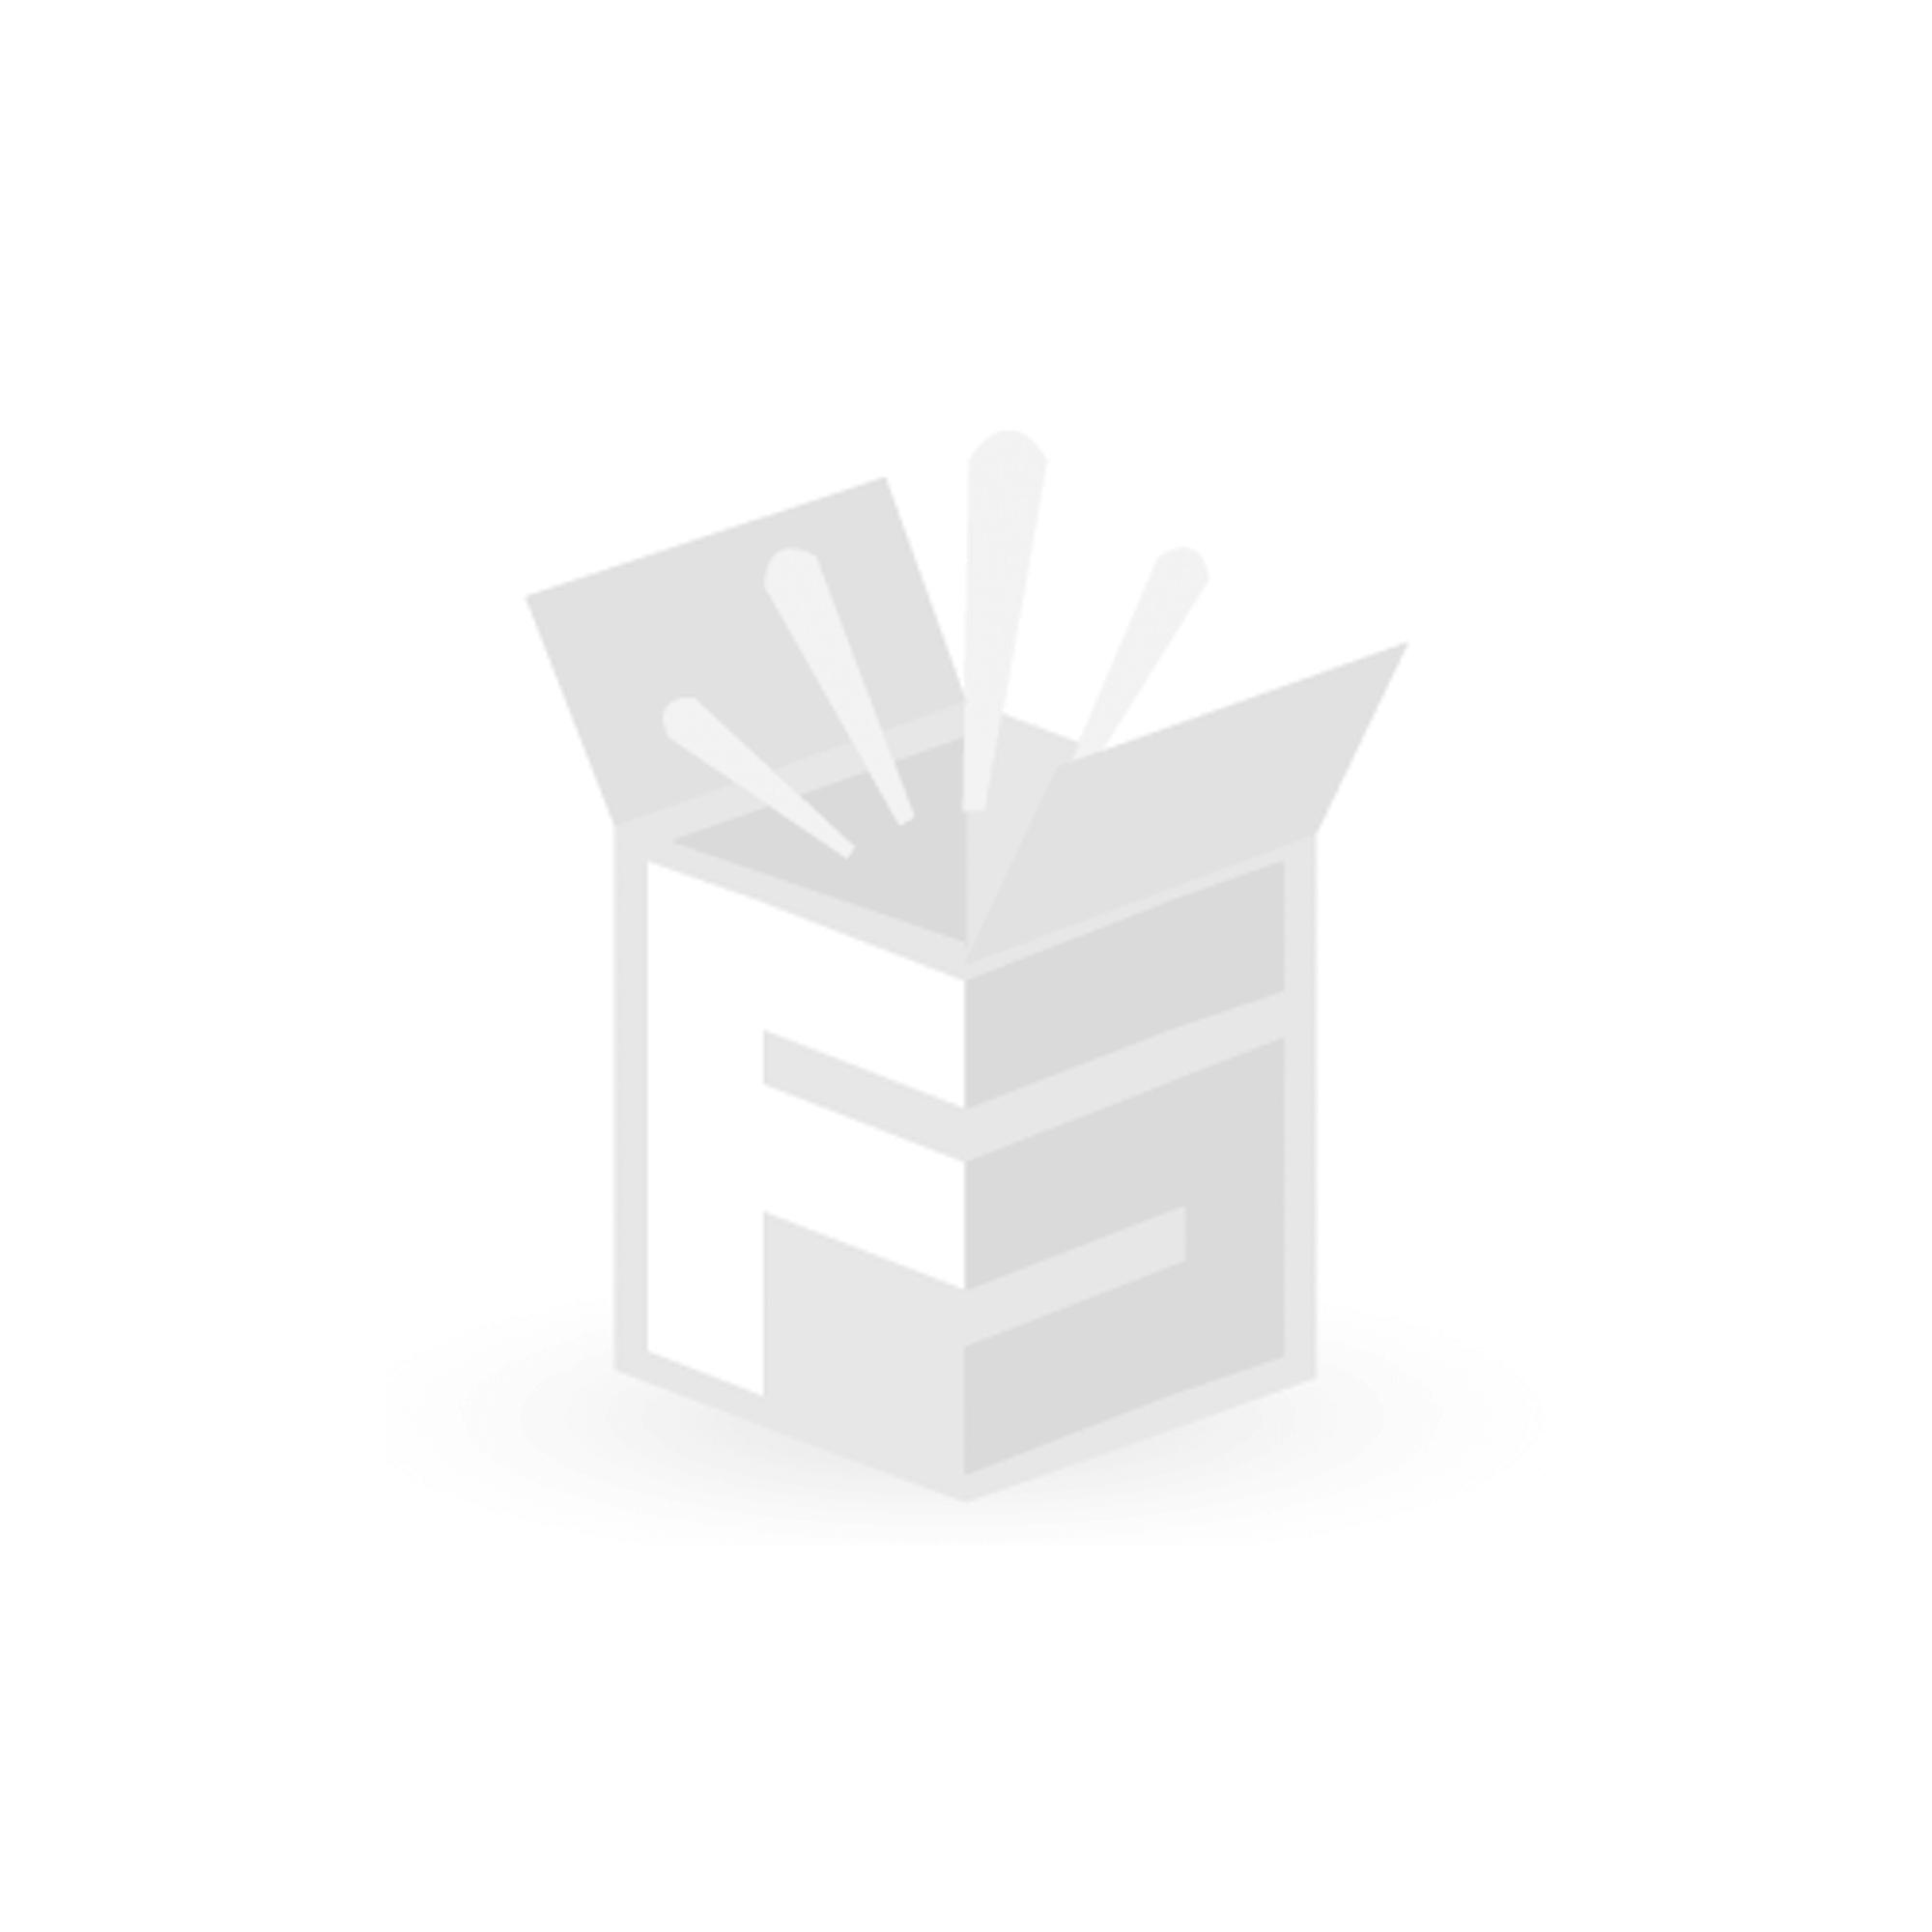 dameco Image en bois LED Merry Christmas 40x23cm